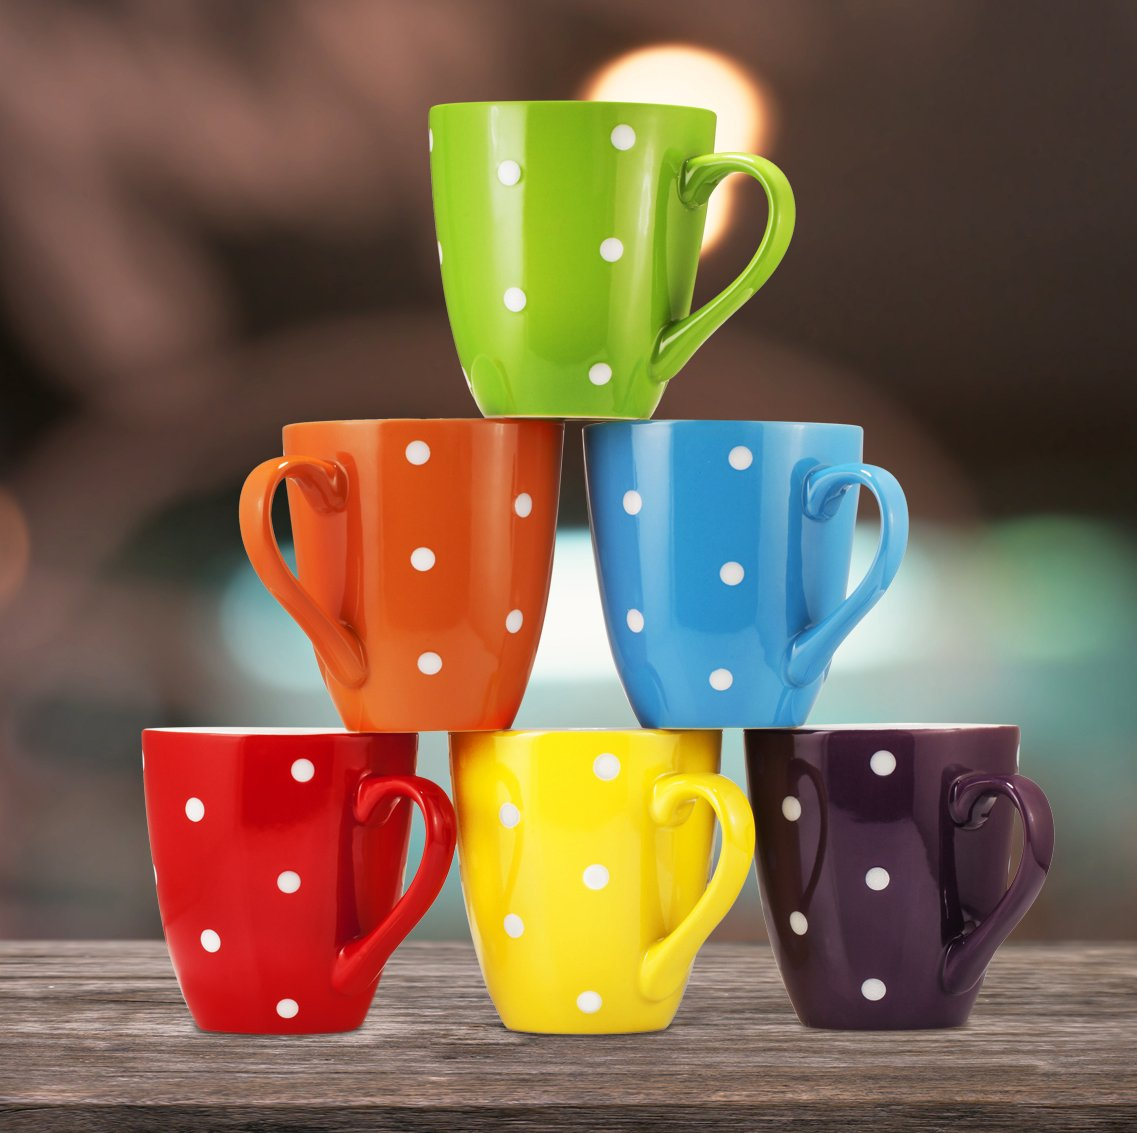 Coffee Mug Set Set of 6 Large-sized 16 Ounce Ceramic Coffee Mugs Restaurant Coffee Mugs By Bruntmor (Polka Dot) by Bruntmor (Image #9)